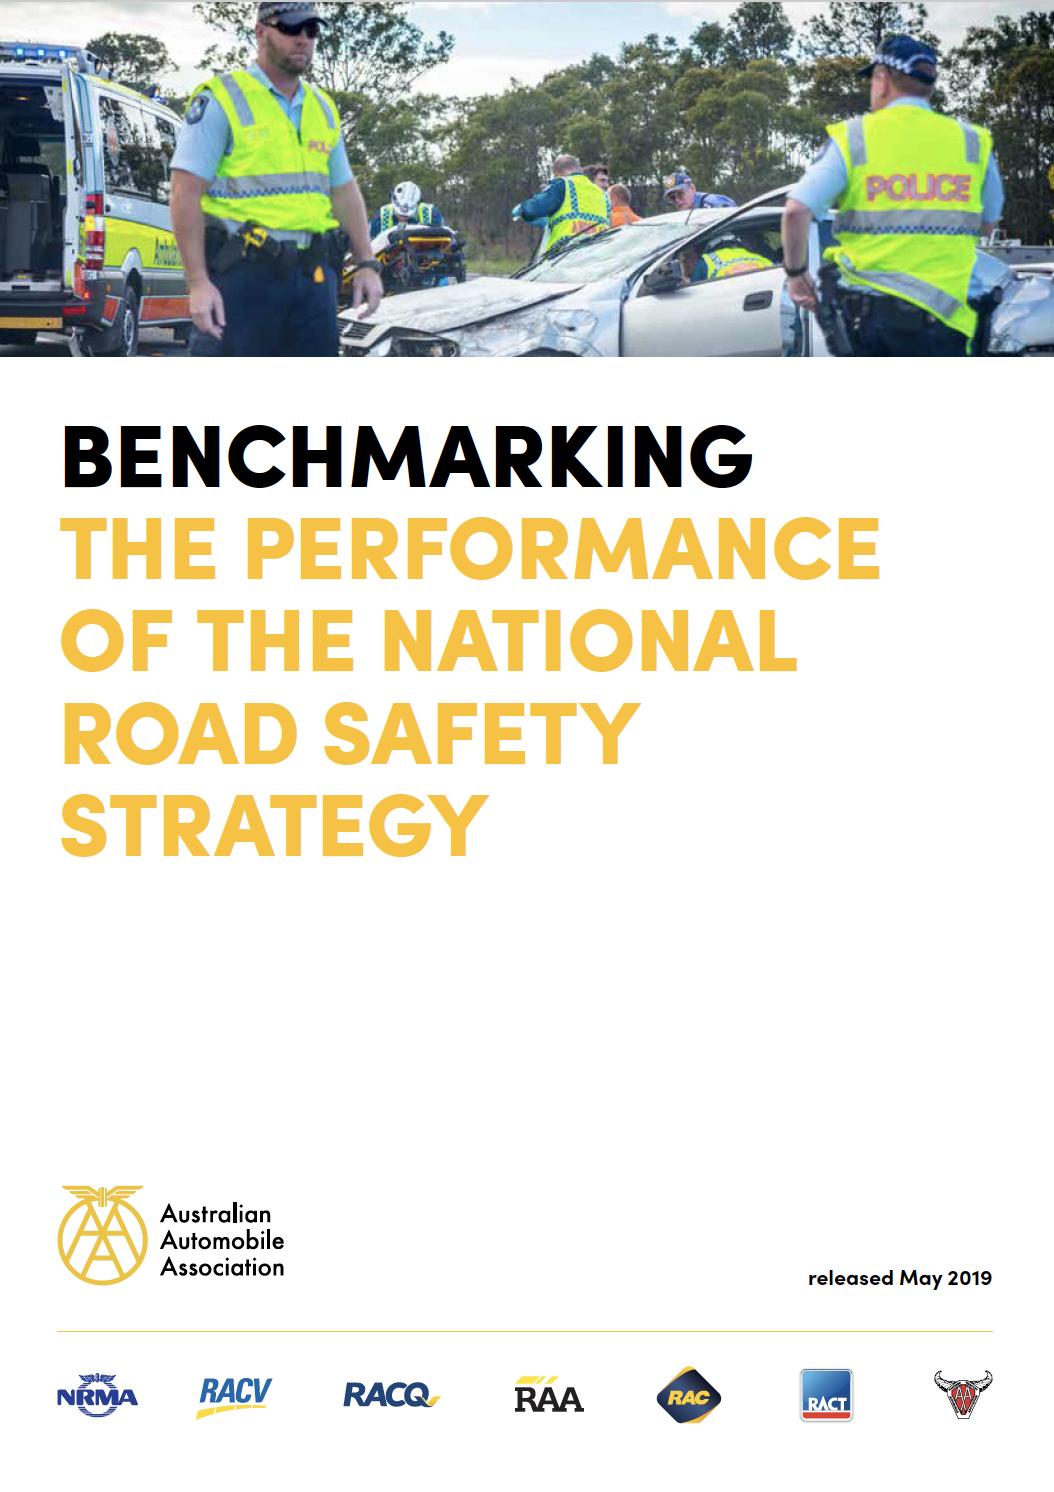 Australian Automotive Association Report, May 2019